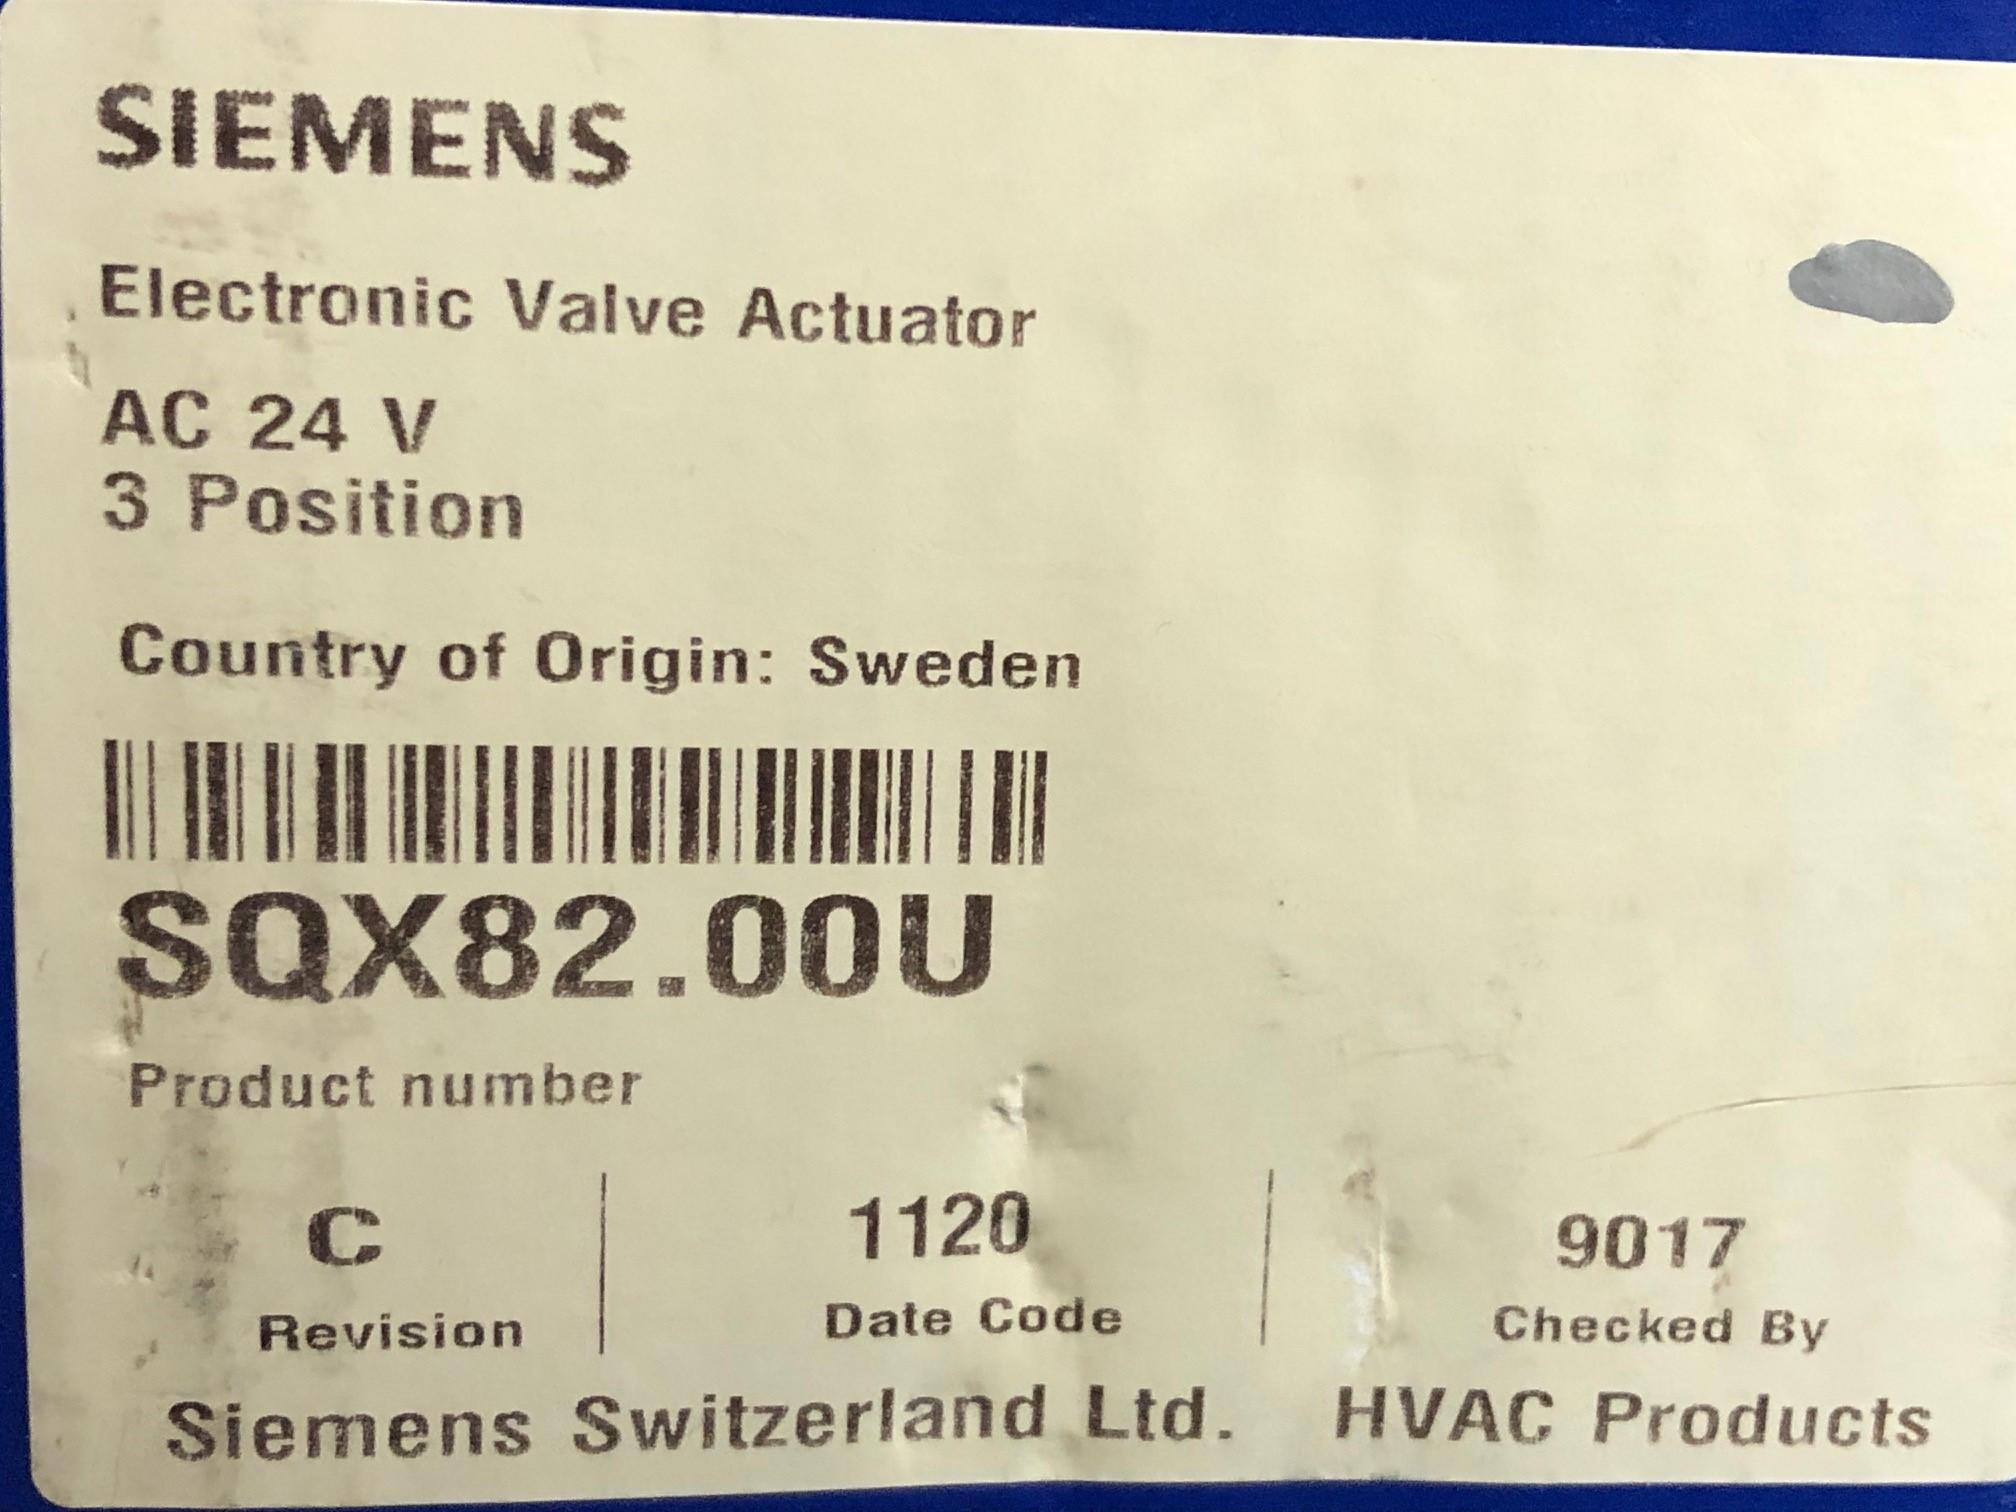 Siemens SQX82.00U